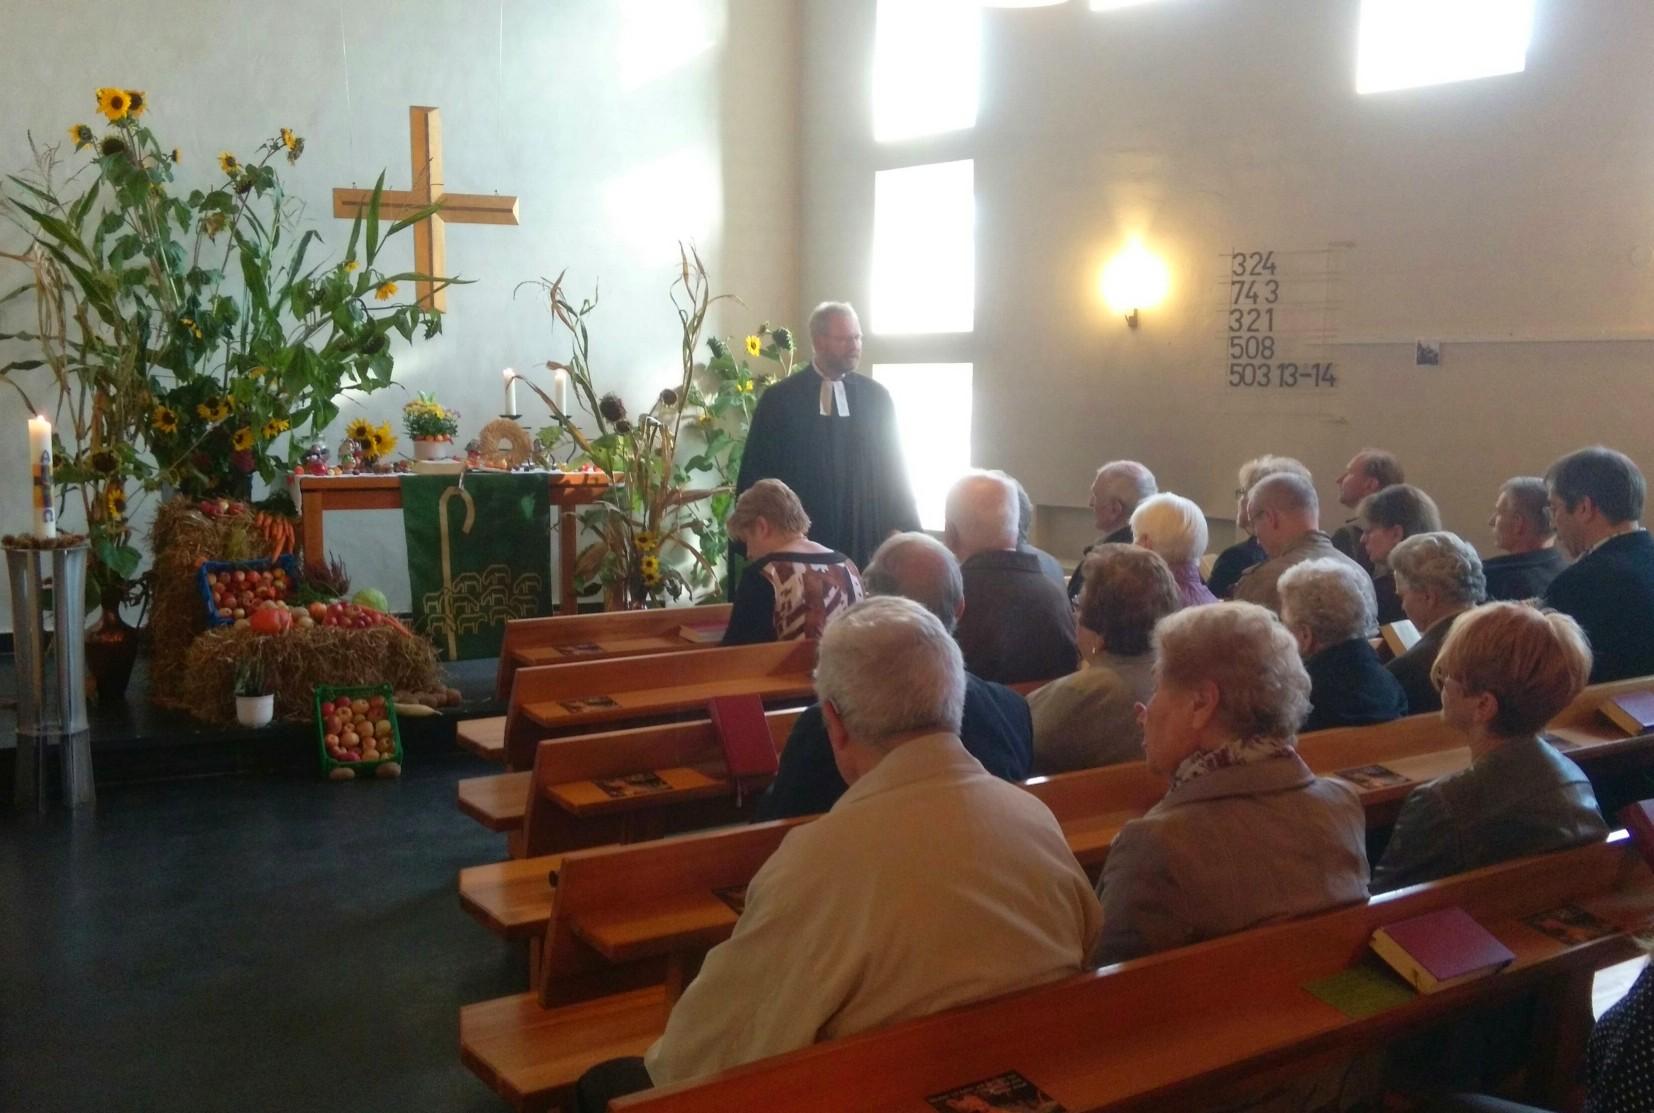 Erntedankgottesdienst in Knickhagen